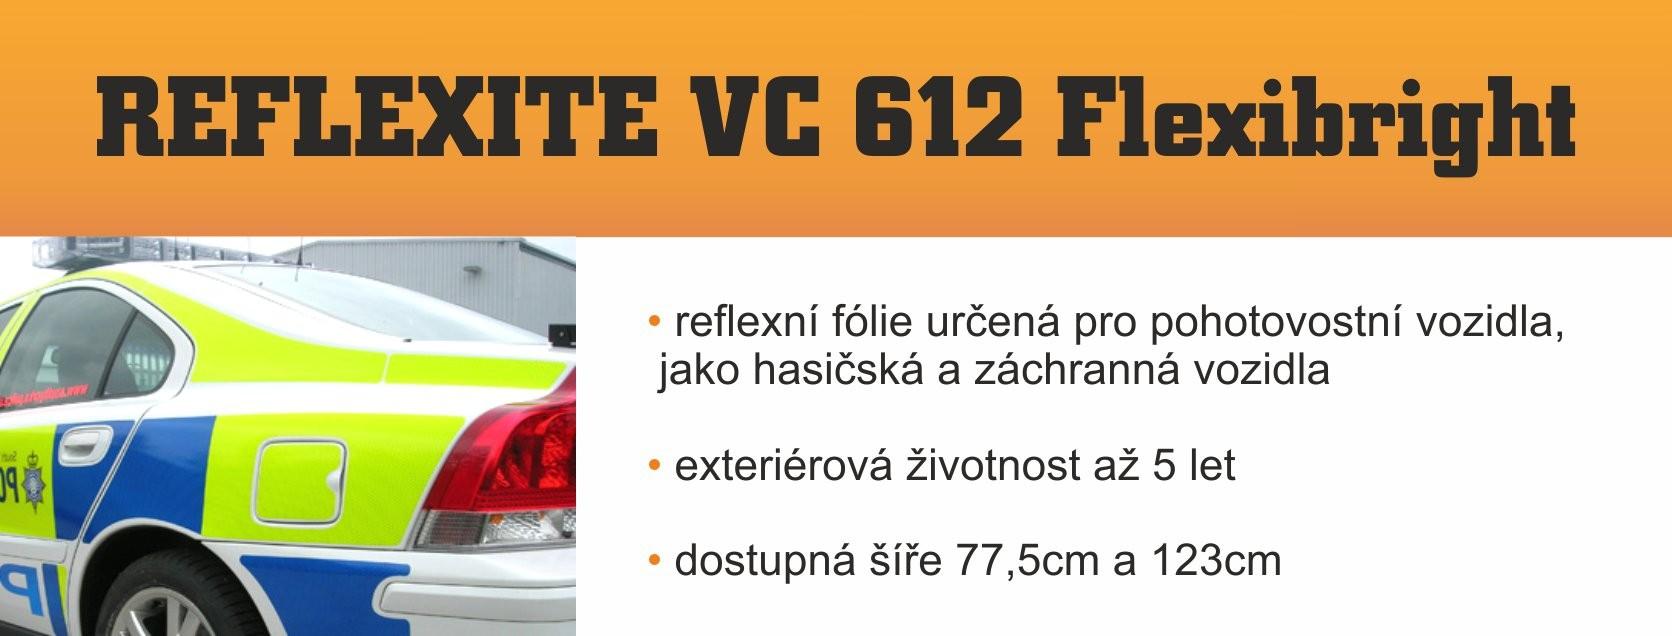 Reflexite VC 612 Flexibright